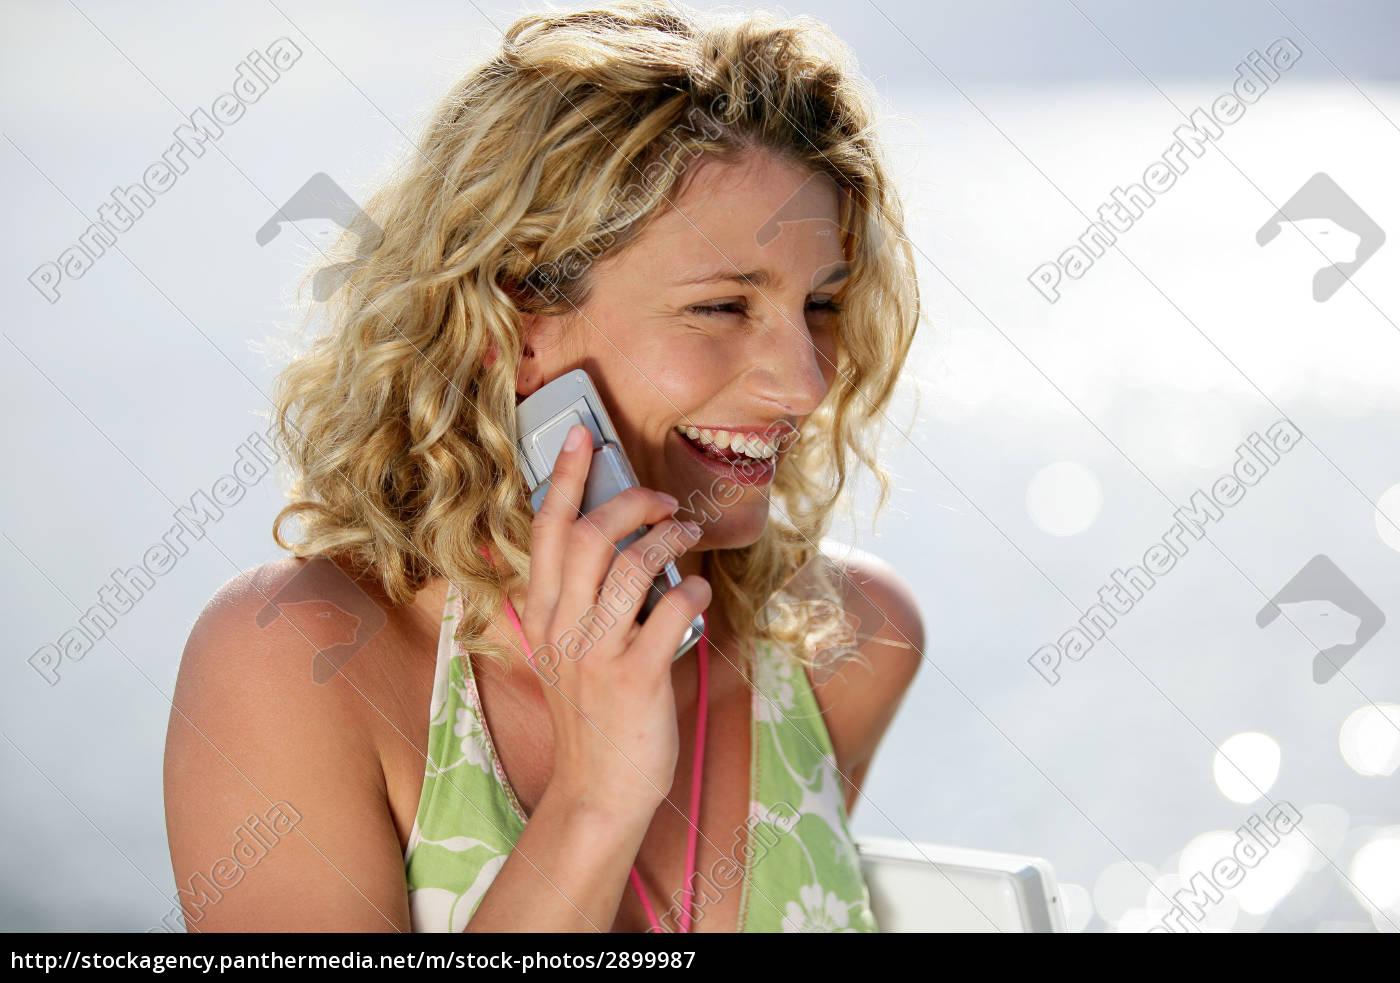 woman, telephone, phone, profile, laugh, laughs - 2899987